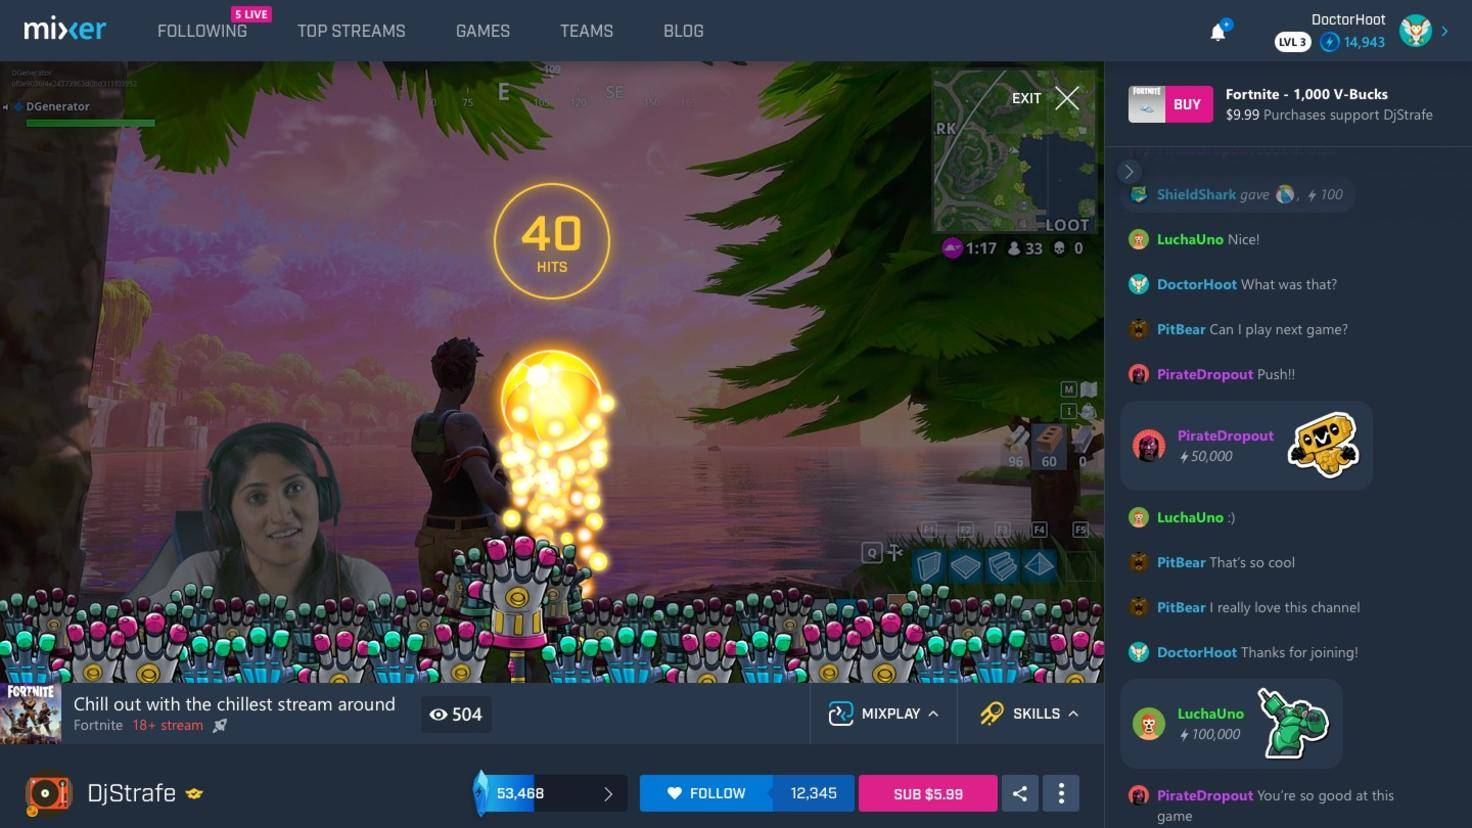 mixer-screenshot-skills-rallies